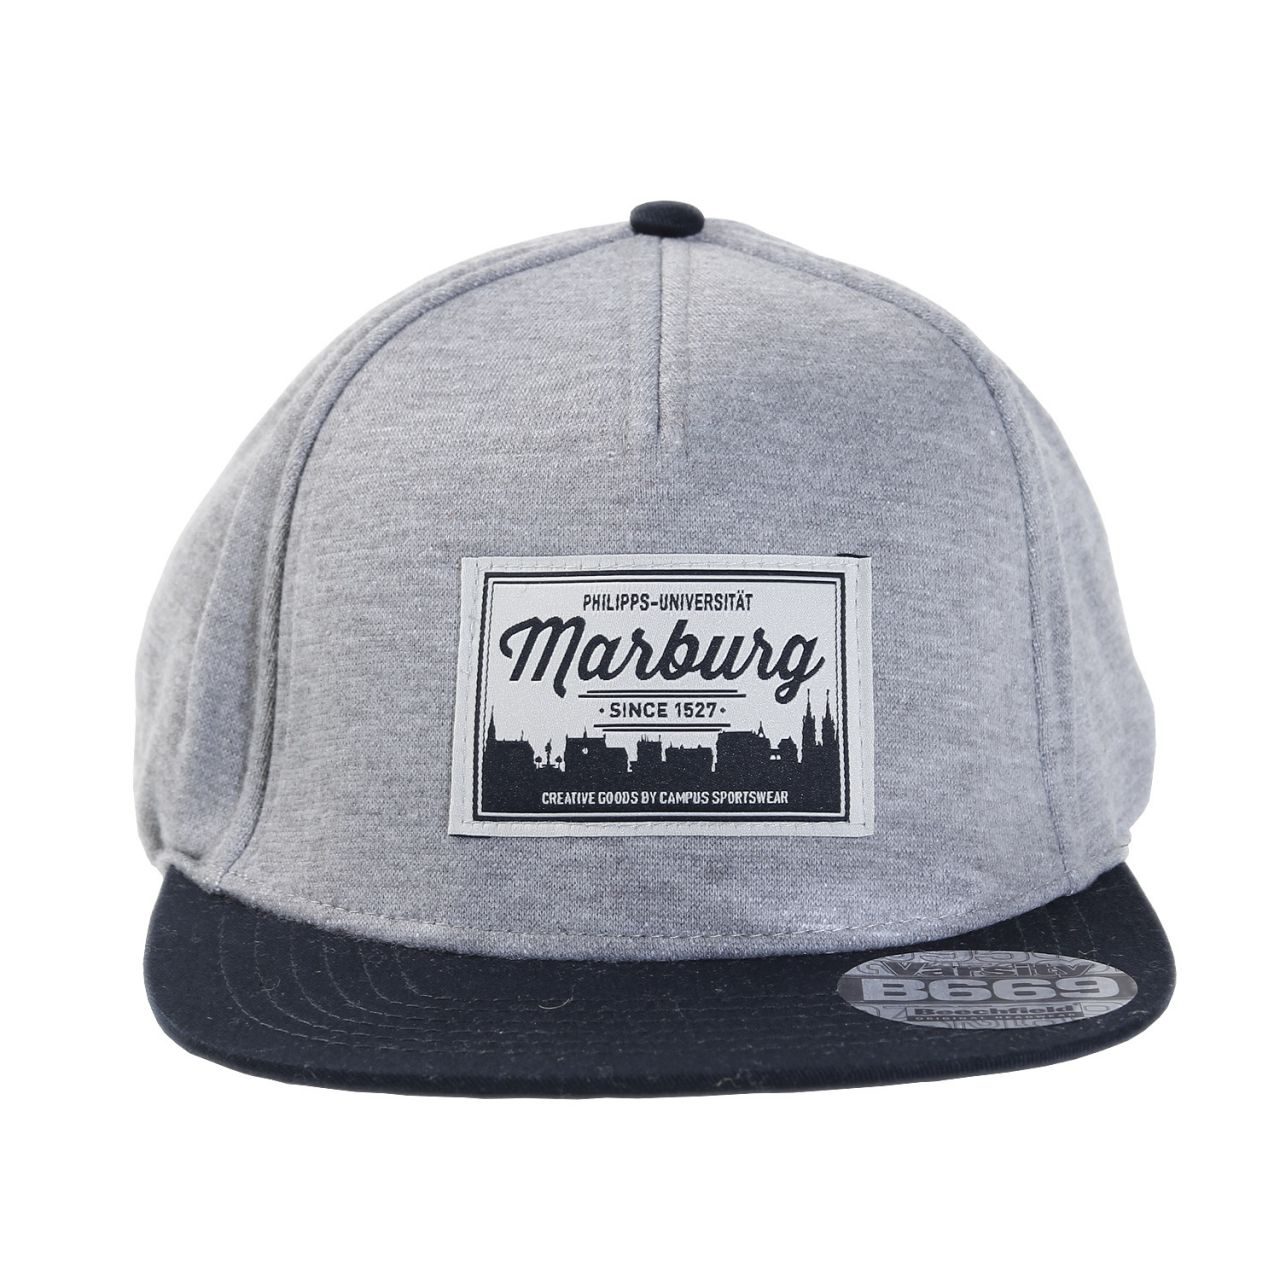 Jersey Cap, grey/navy, label